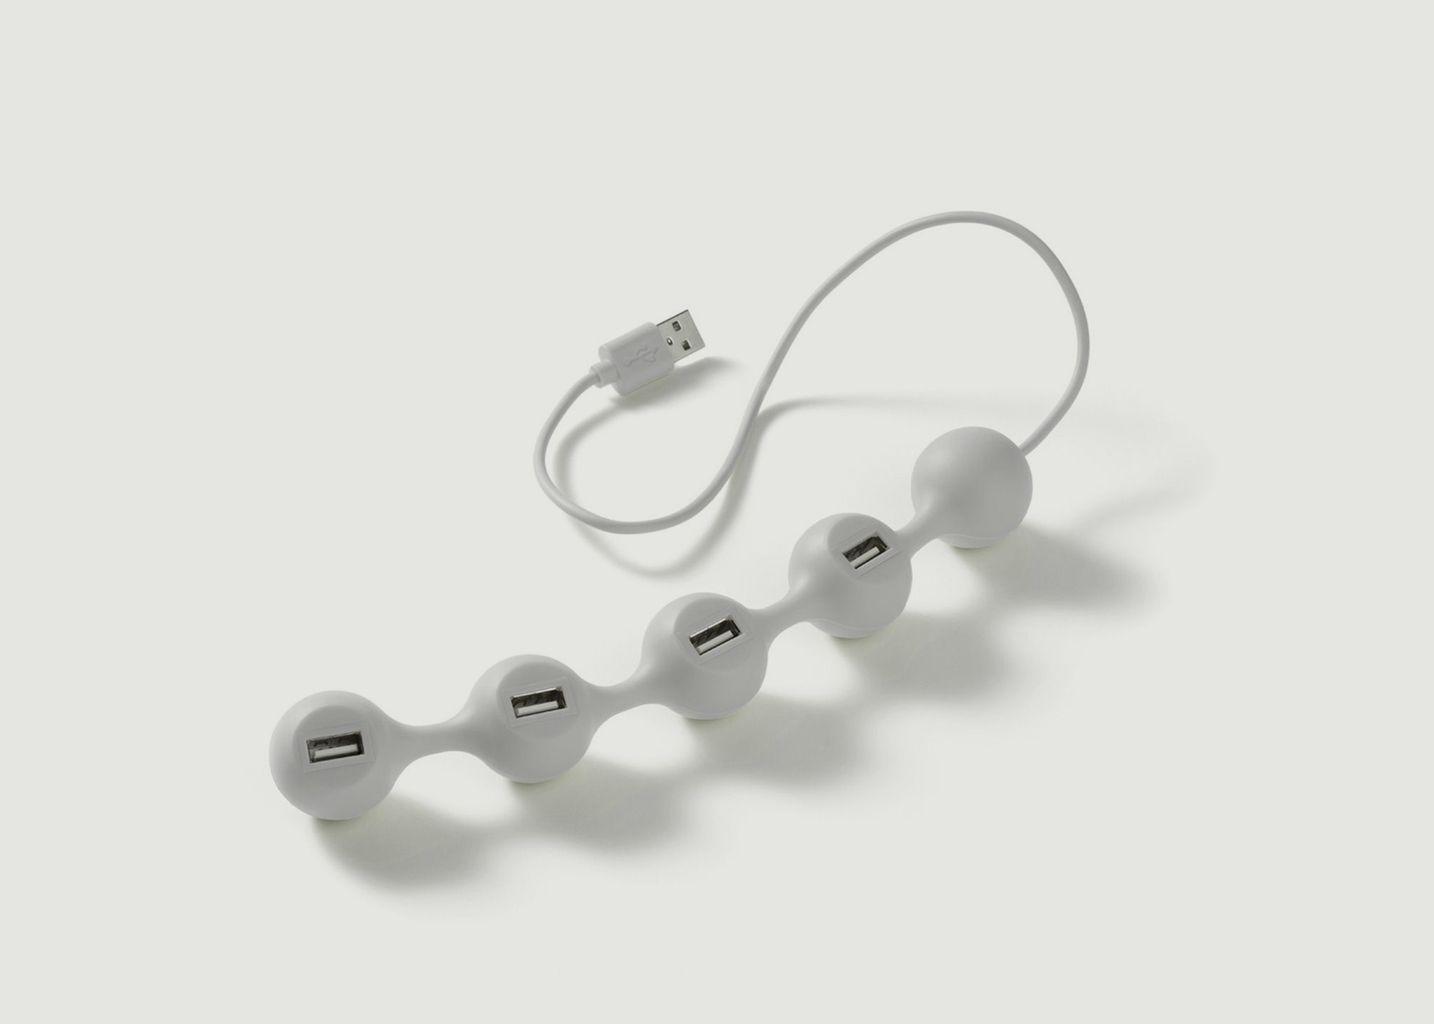 Multi-Port USB Peas Hub - Lexon Design